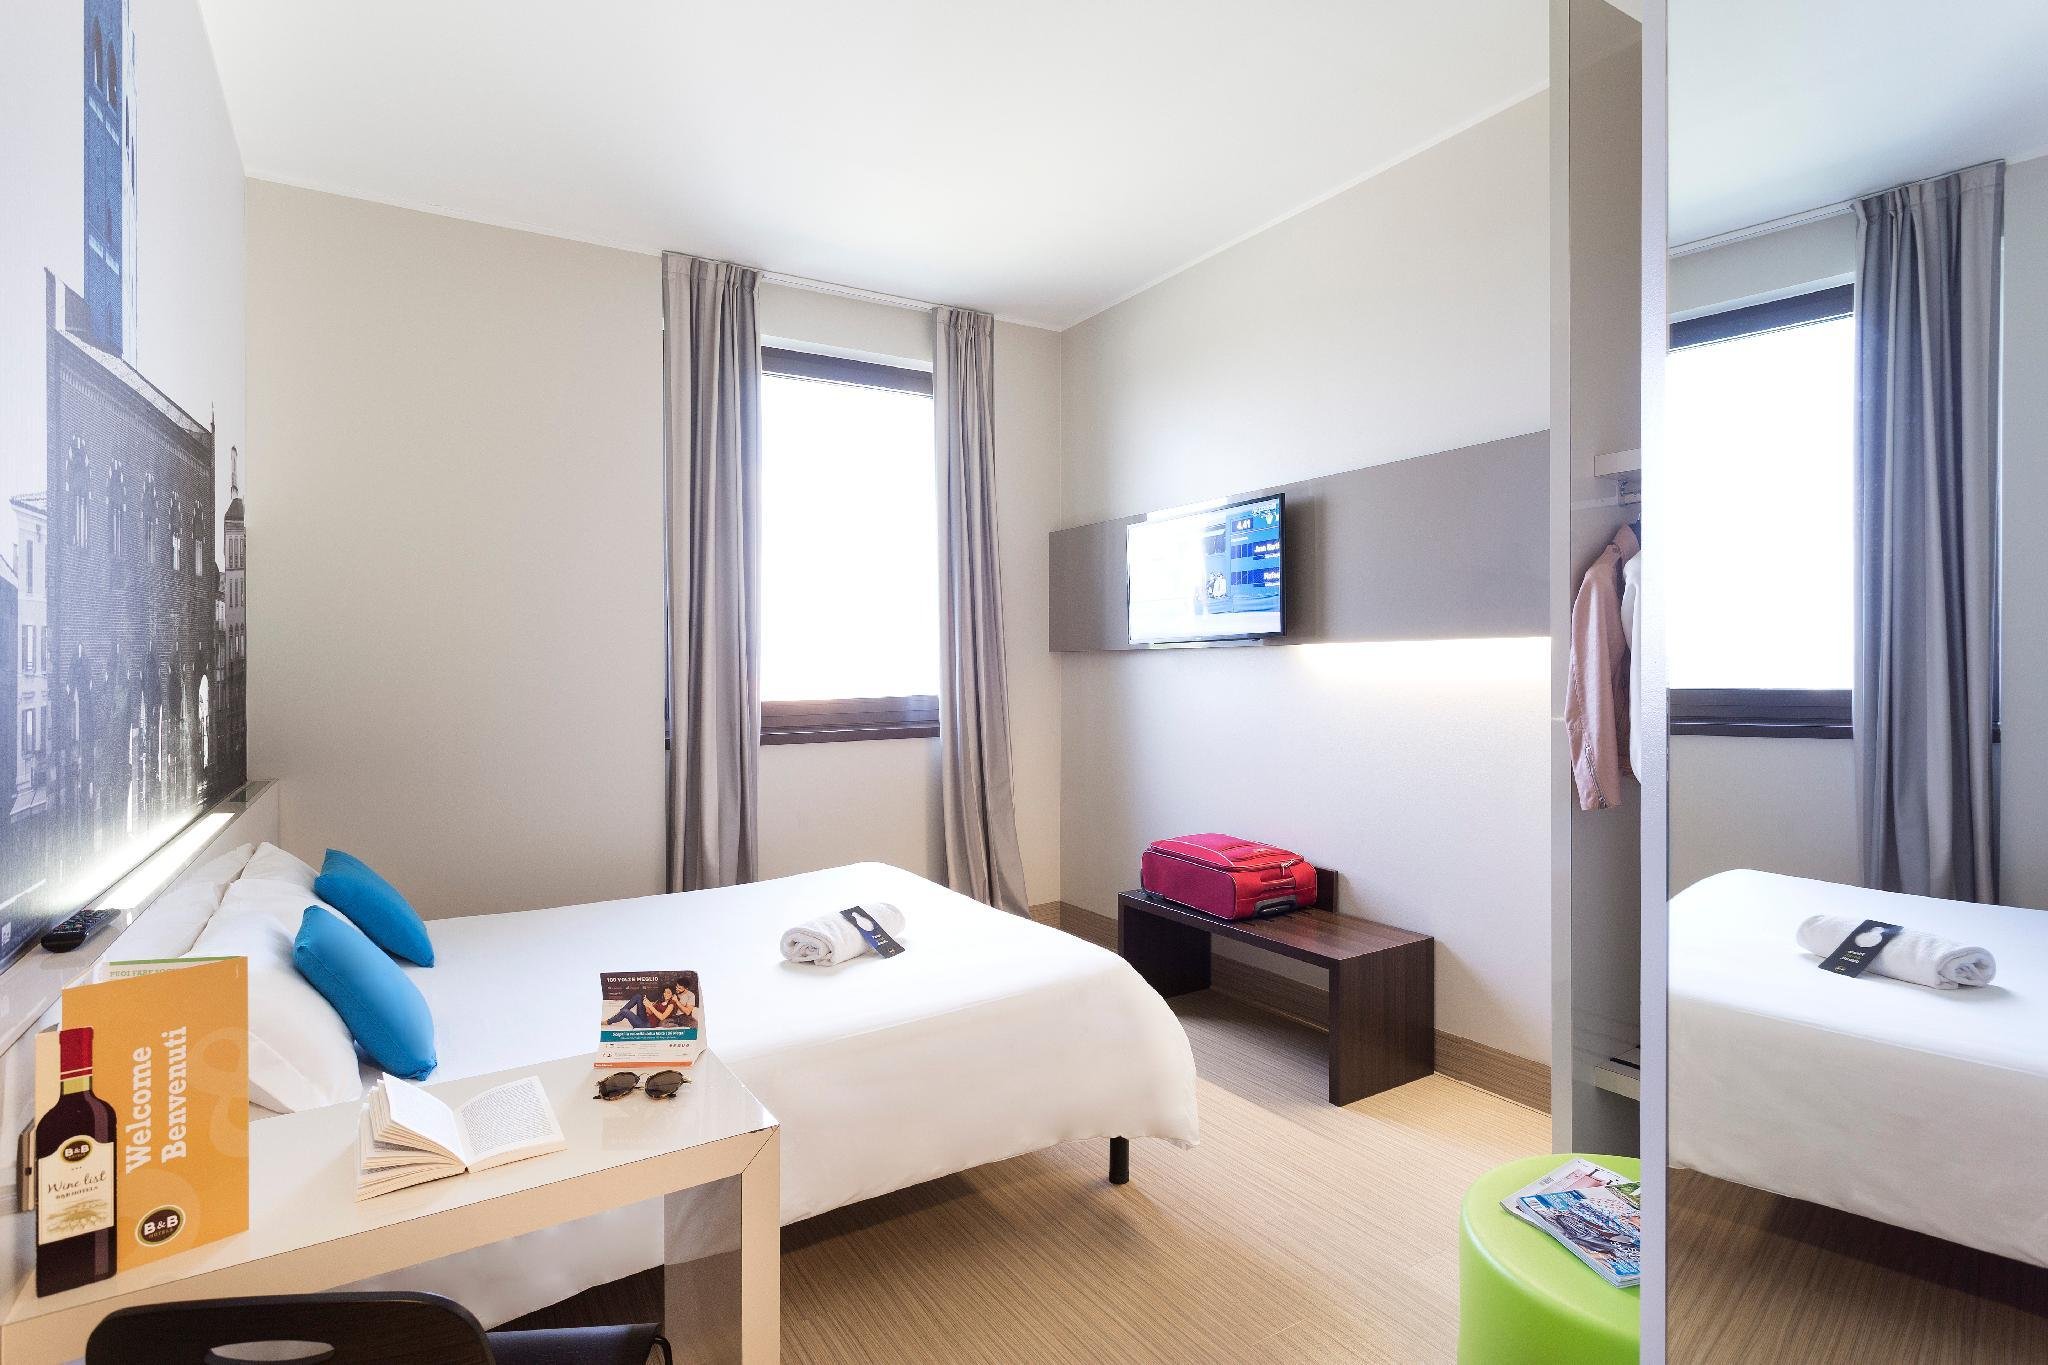 B&B Hotel Milano - Monza, Italien ab 39 € - agoda.com